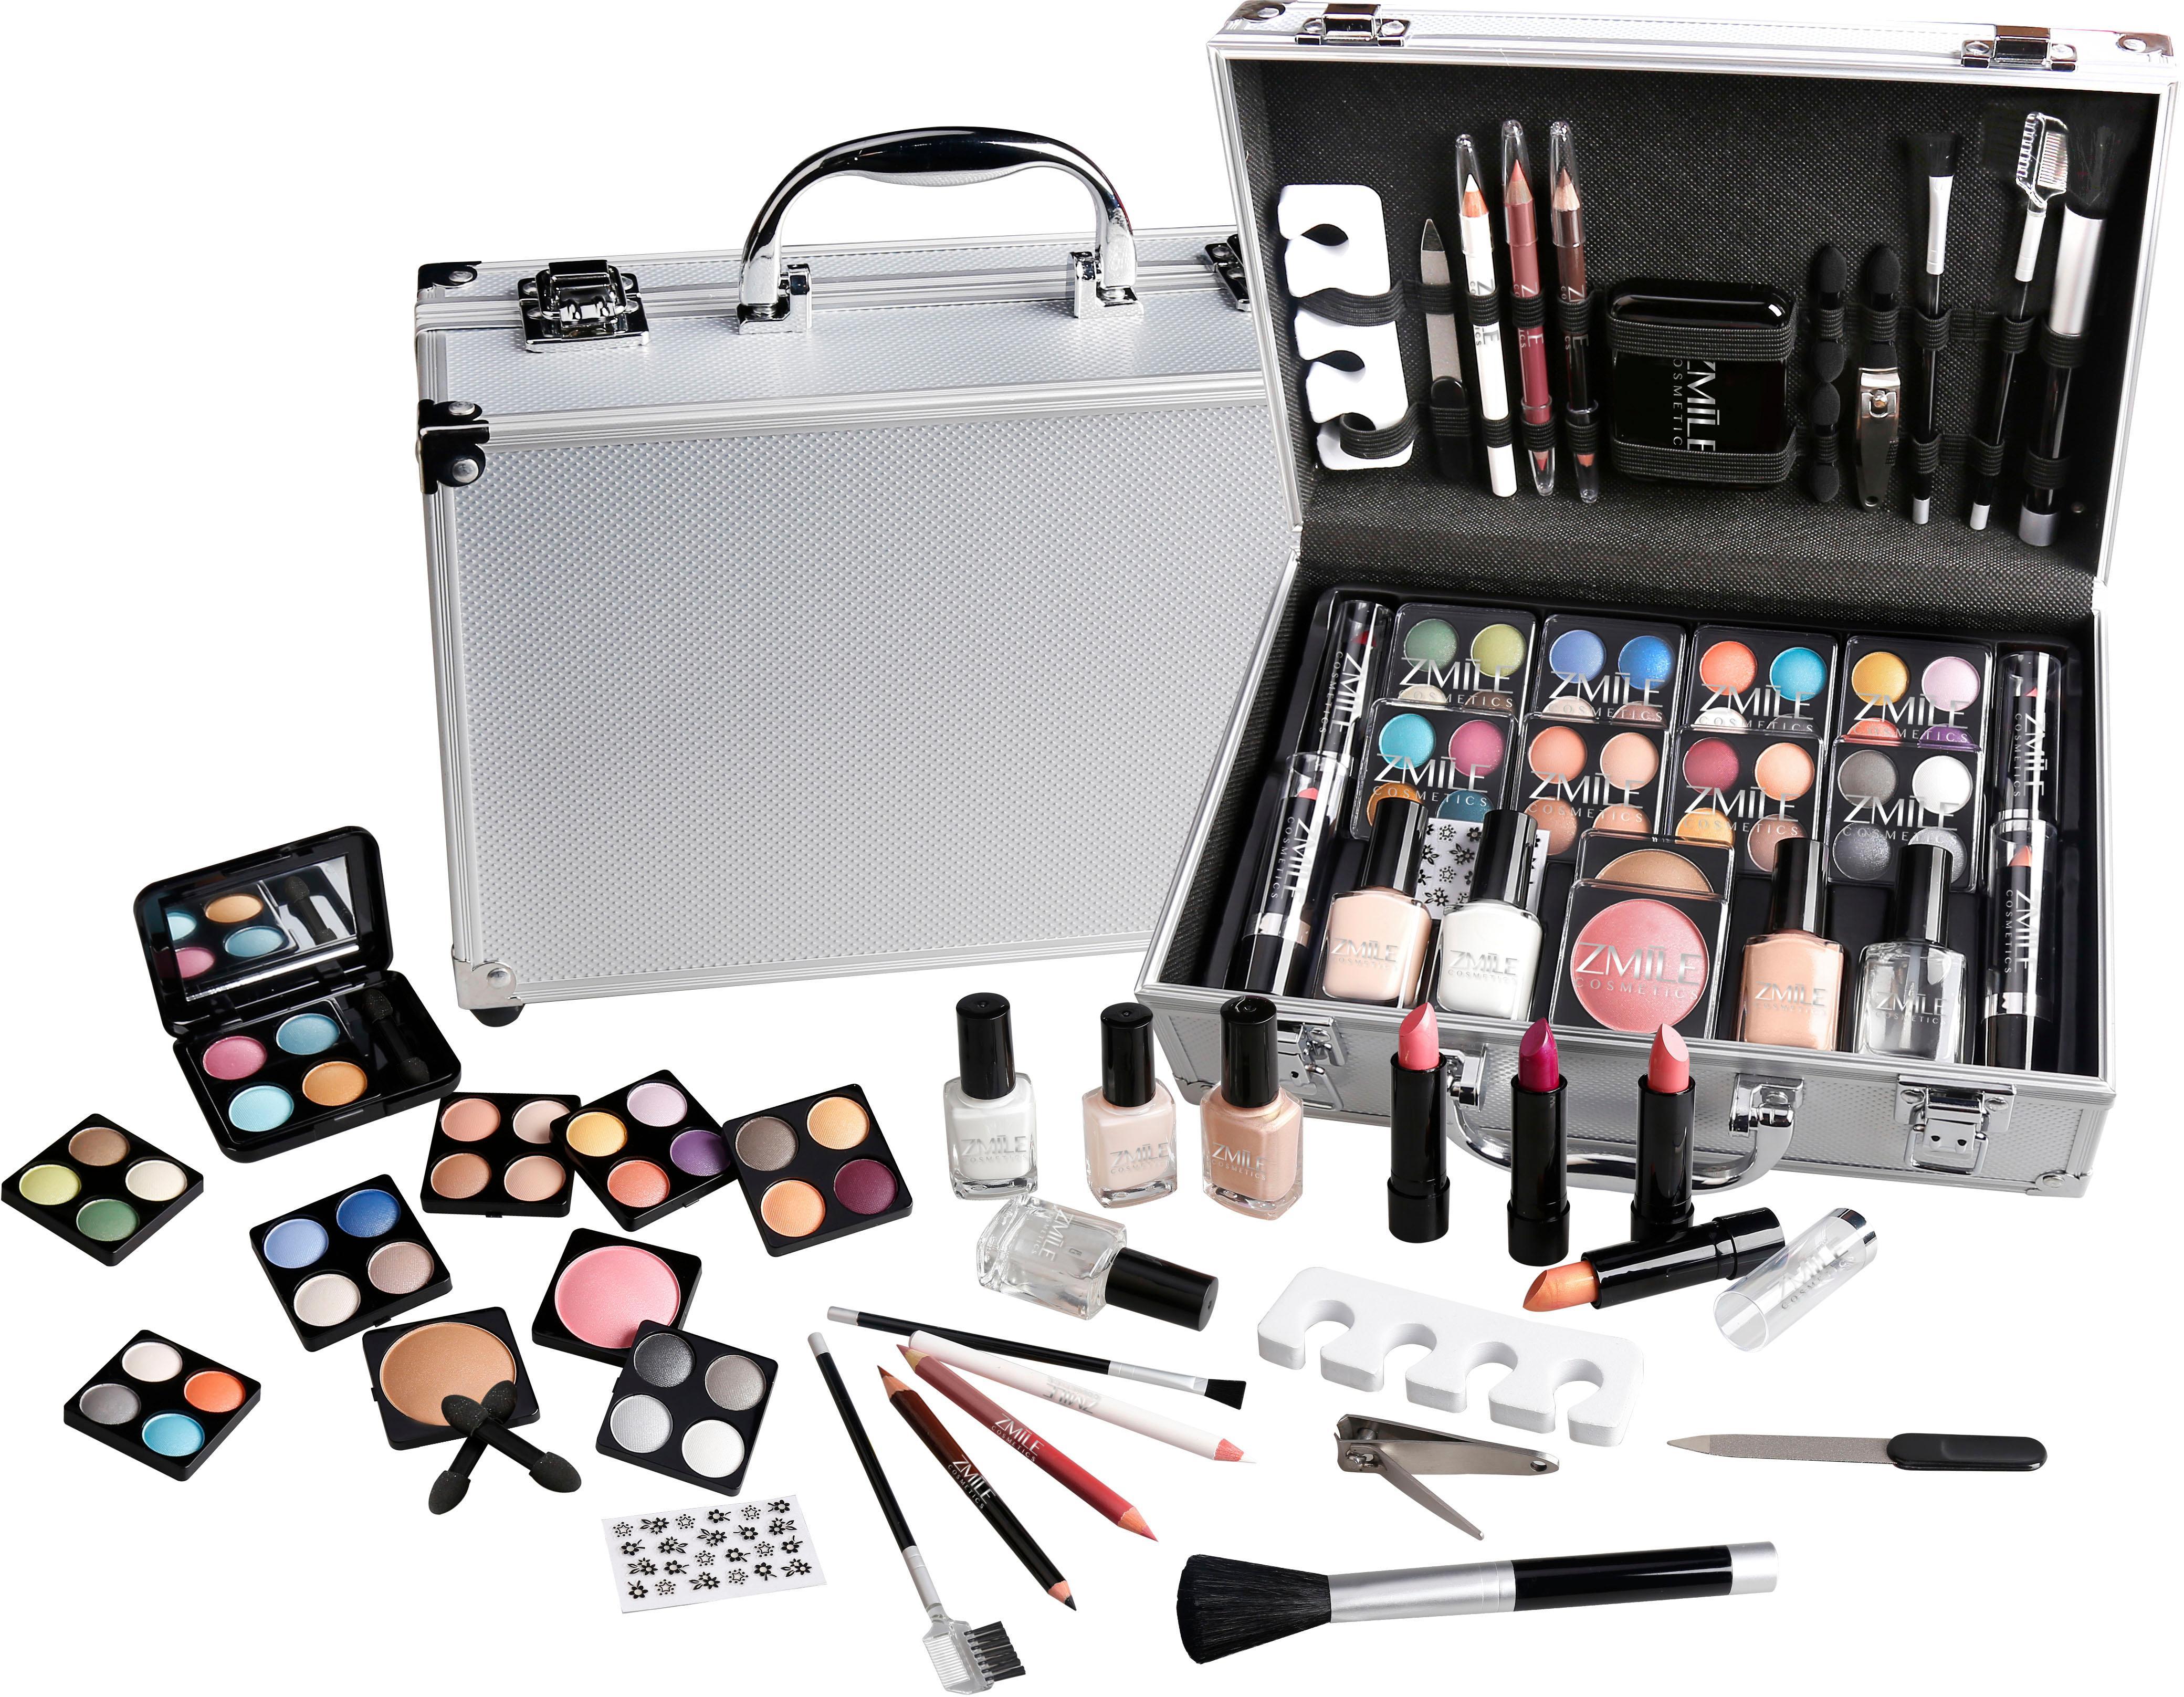 ZMILE COSMETICS Schmink-Koffer French Manicure  57-tlg.   Taschen > Koffer & Trolleys   Zmile Cosmetics